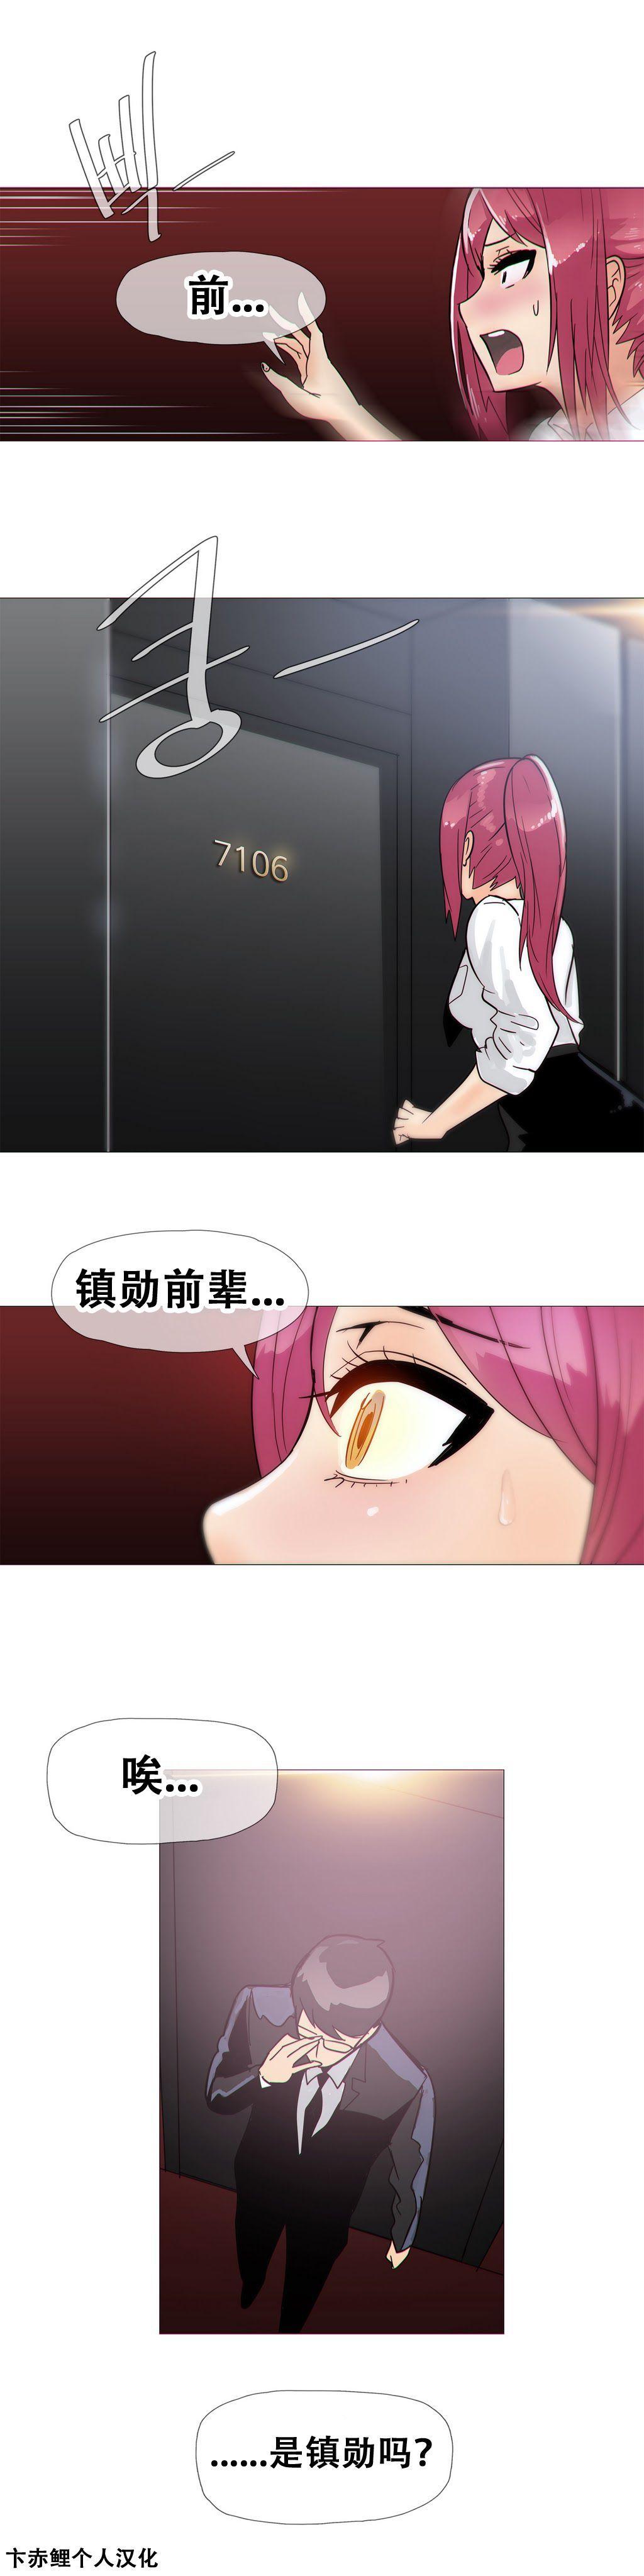 HouseHold Affairs 【卞赤鲤个人汉化】1~21话(持续更新中) 324